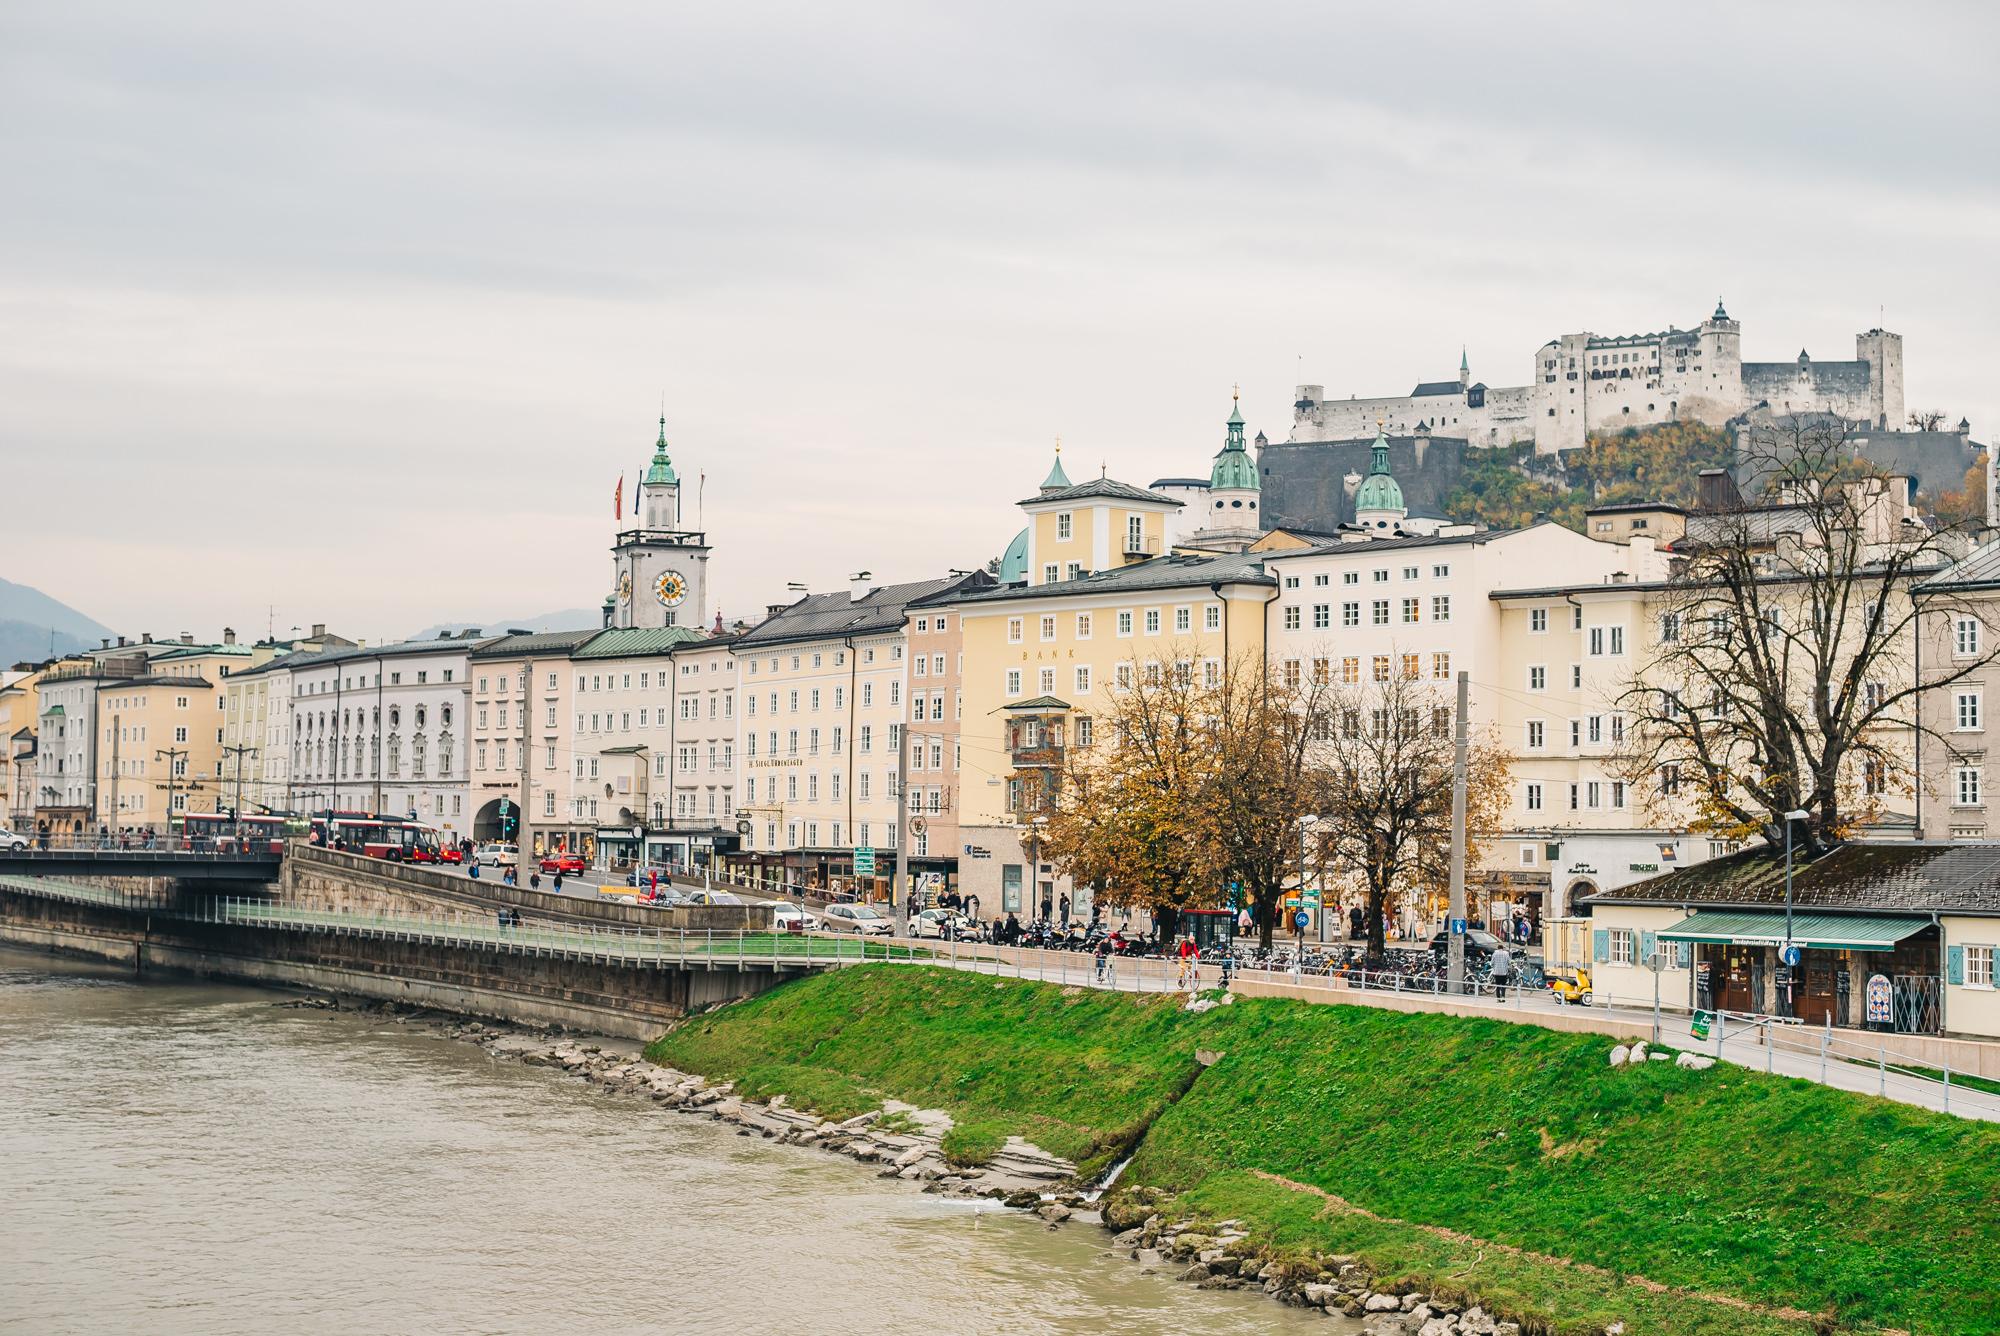 The historic town of Salzburg in Austria